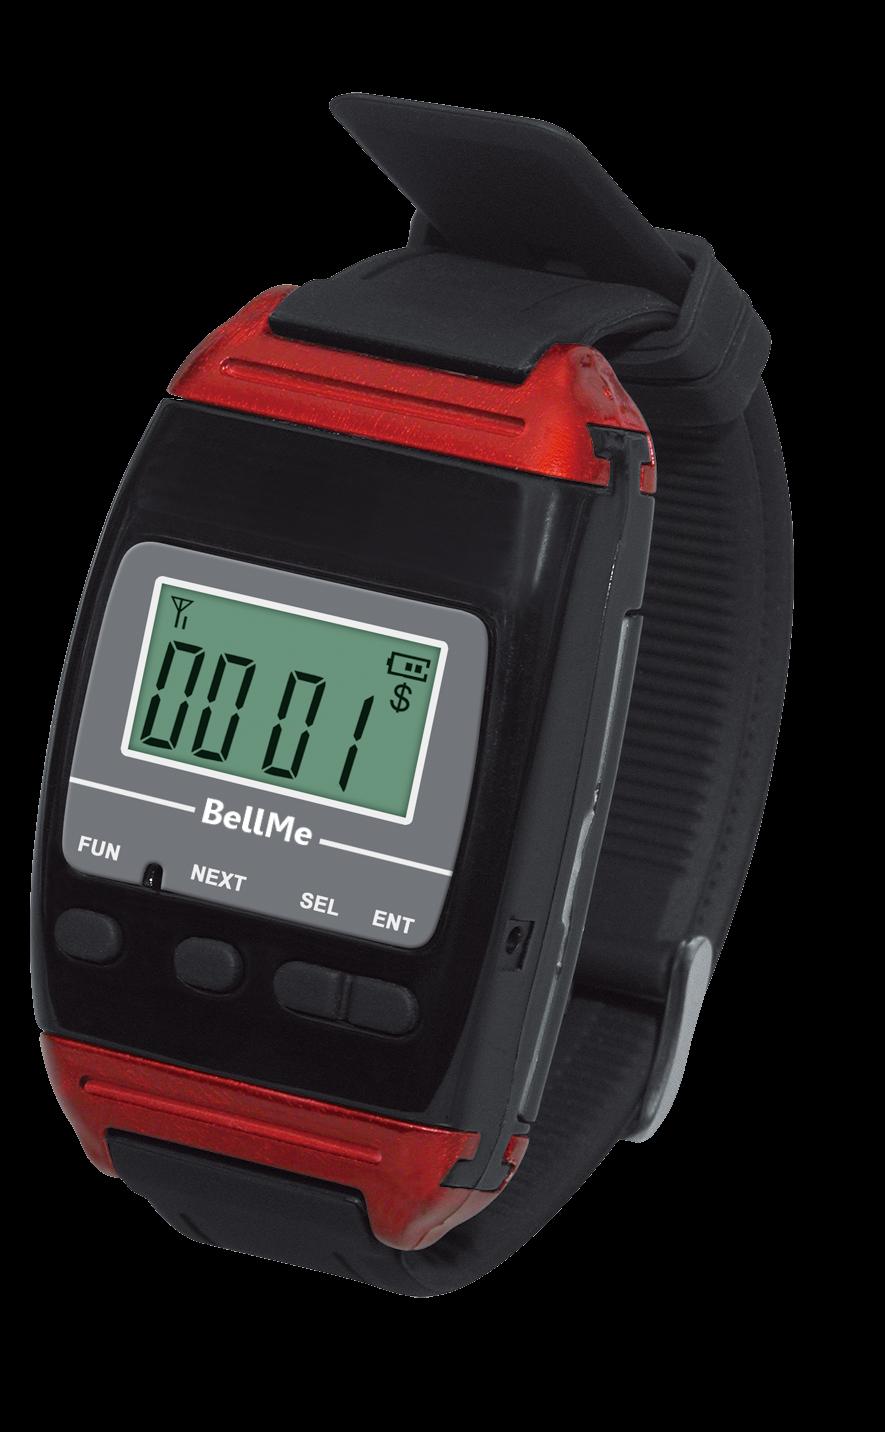 B-650 wrist watch